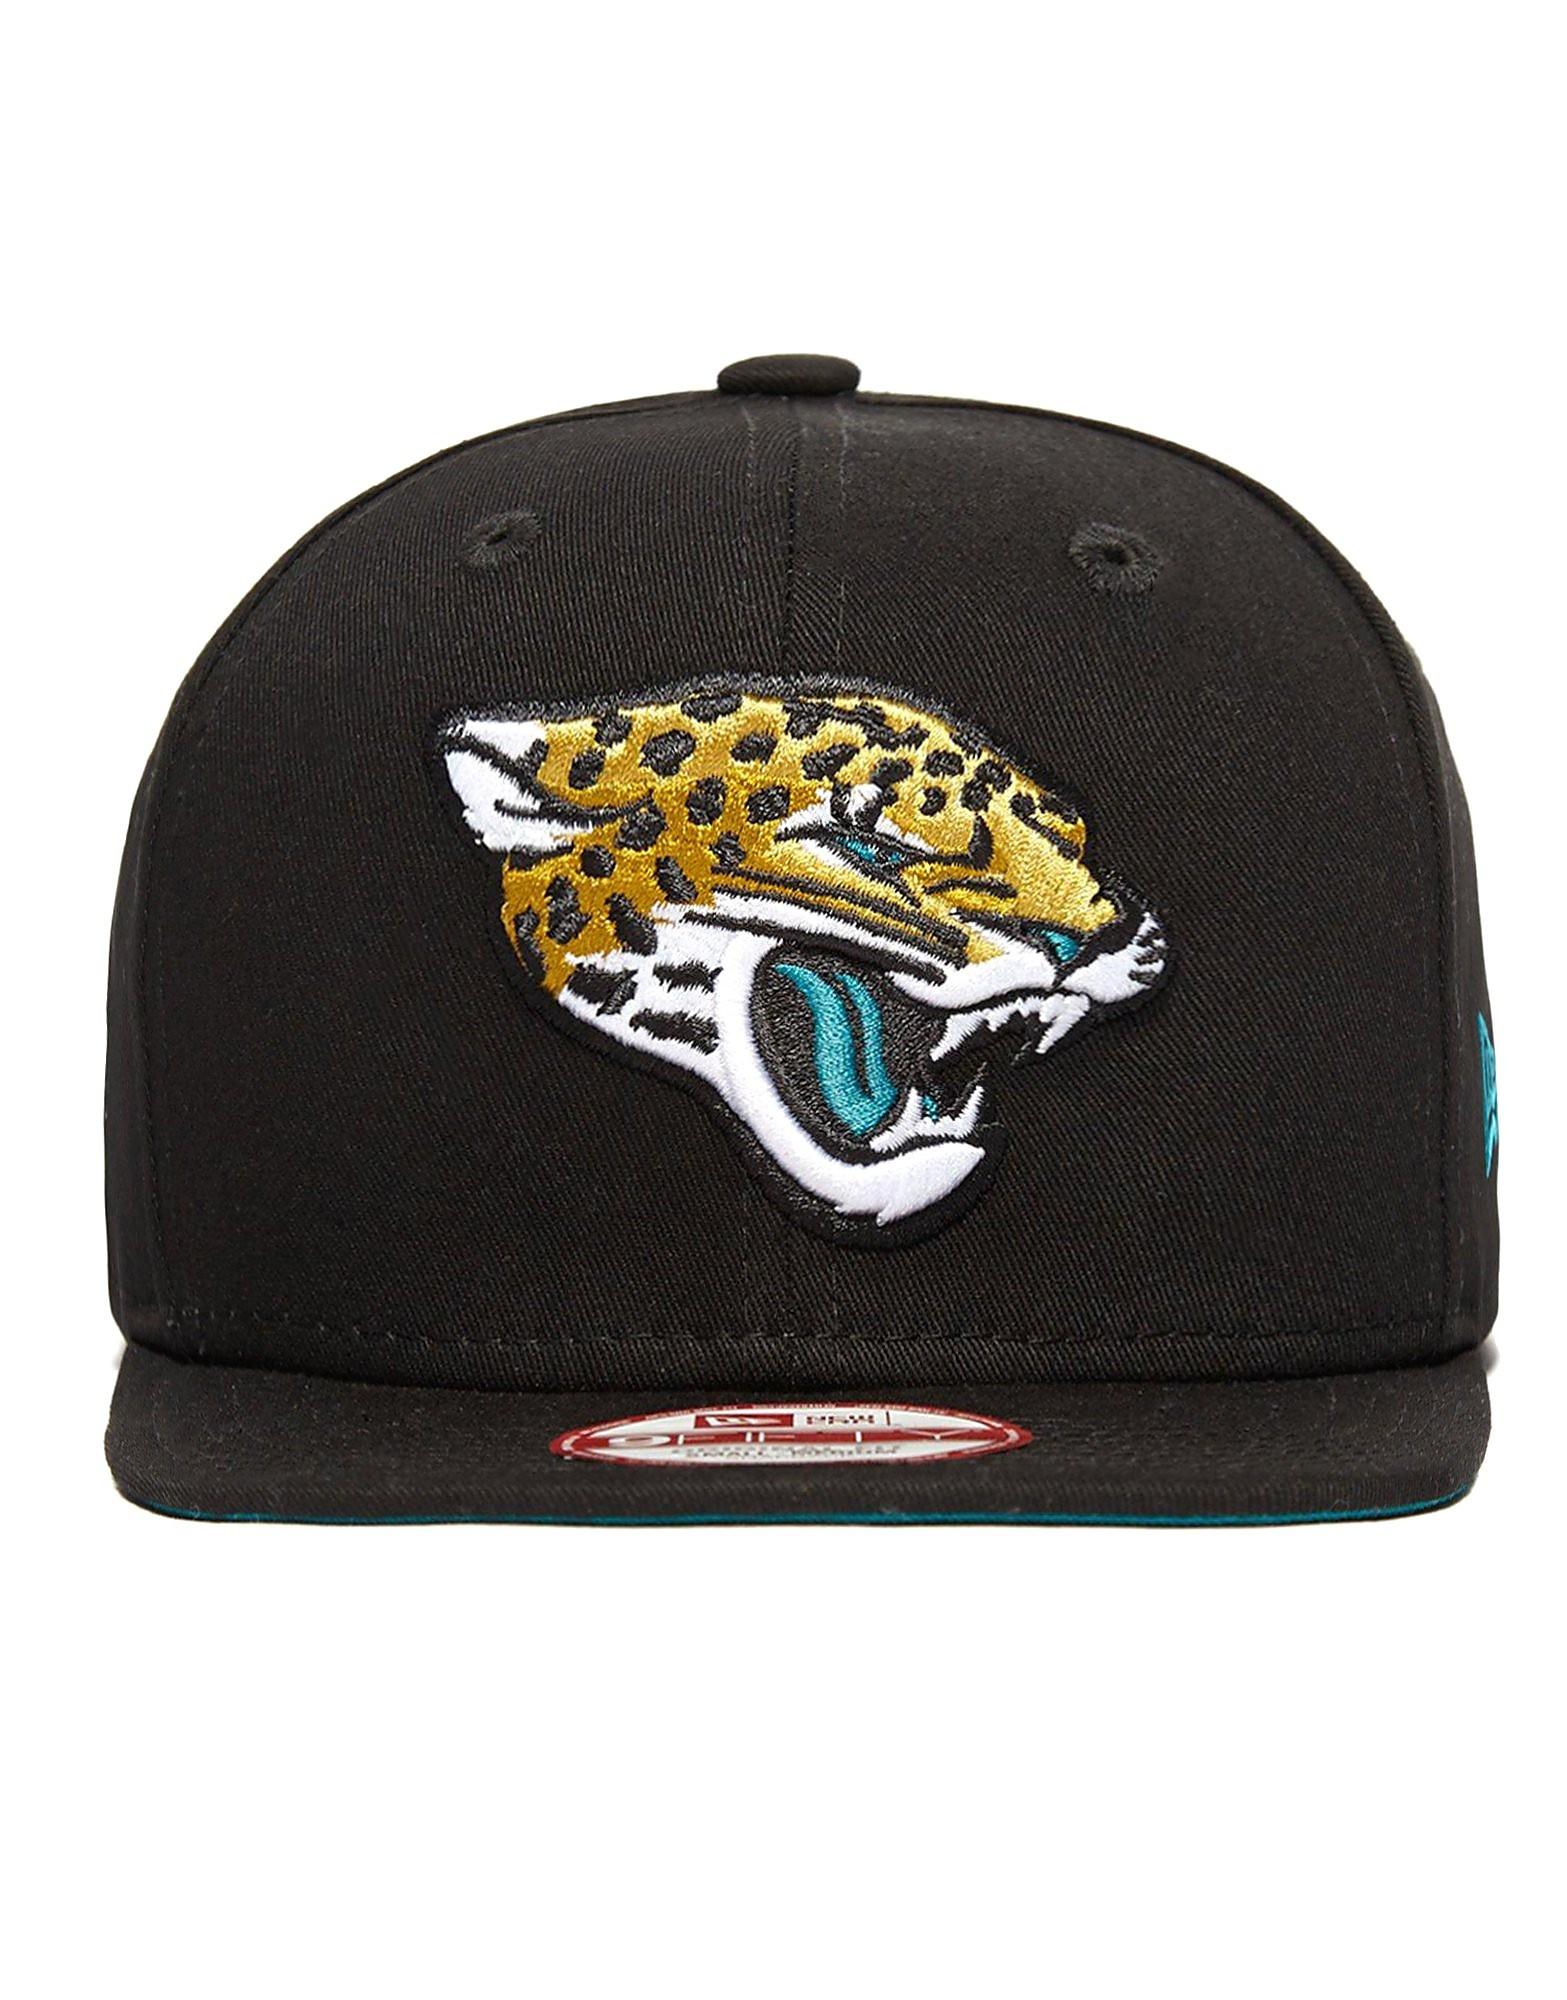 New Era 9FIFTY NFL Jacksonville Jaguars Baseballcap